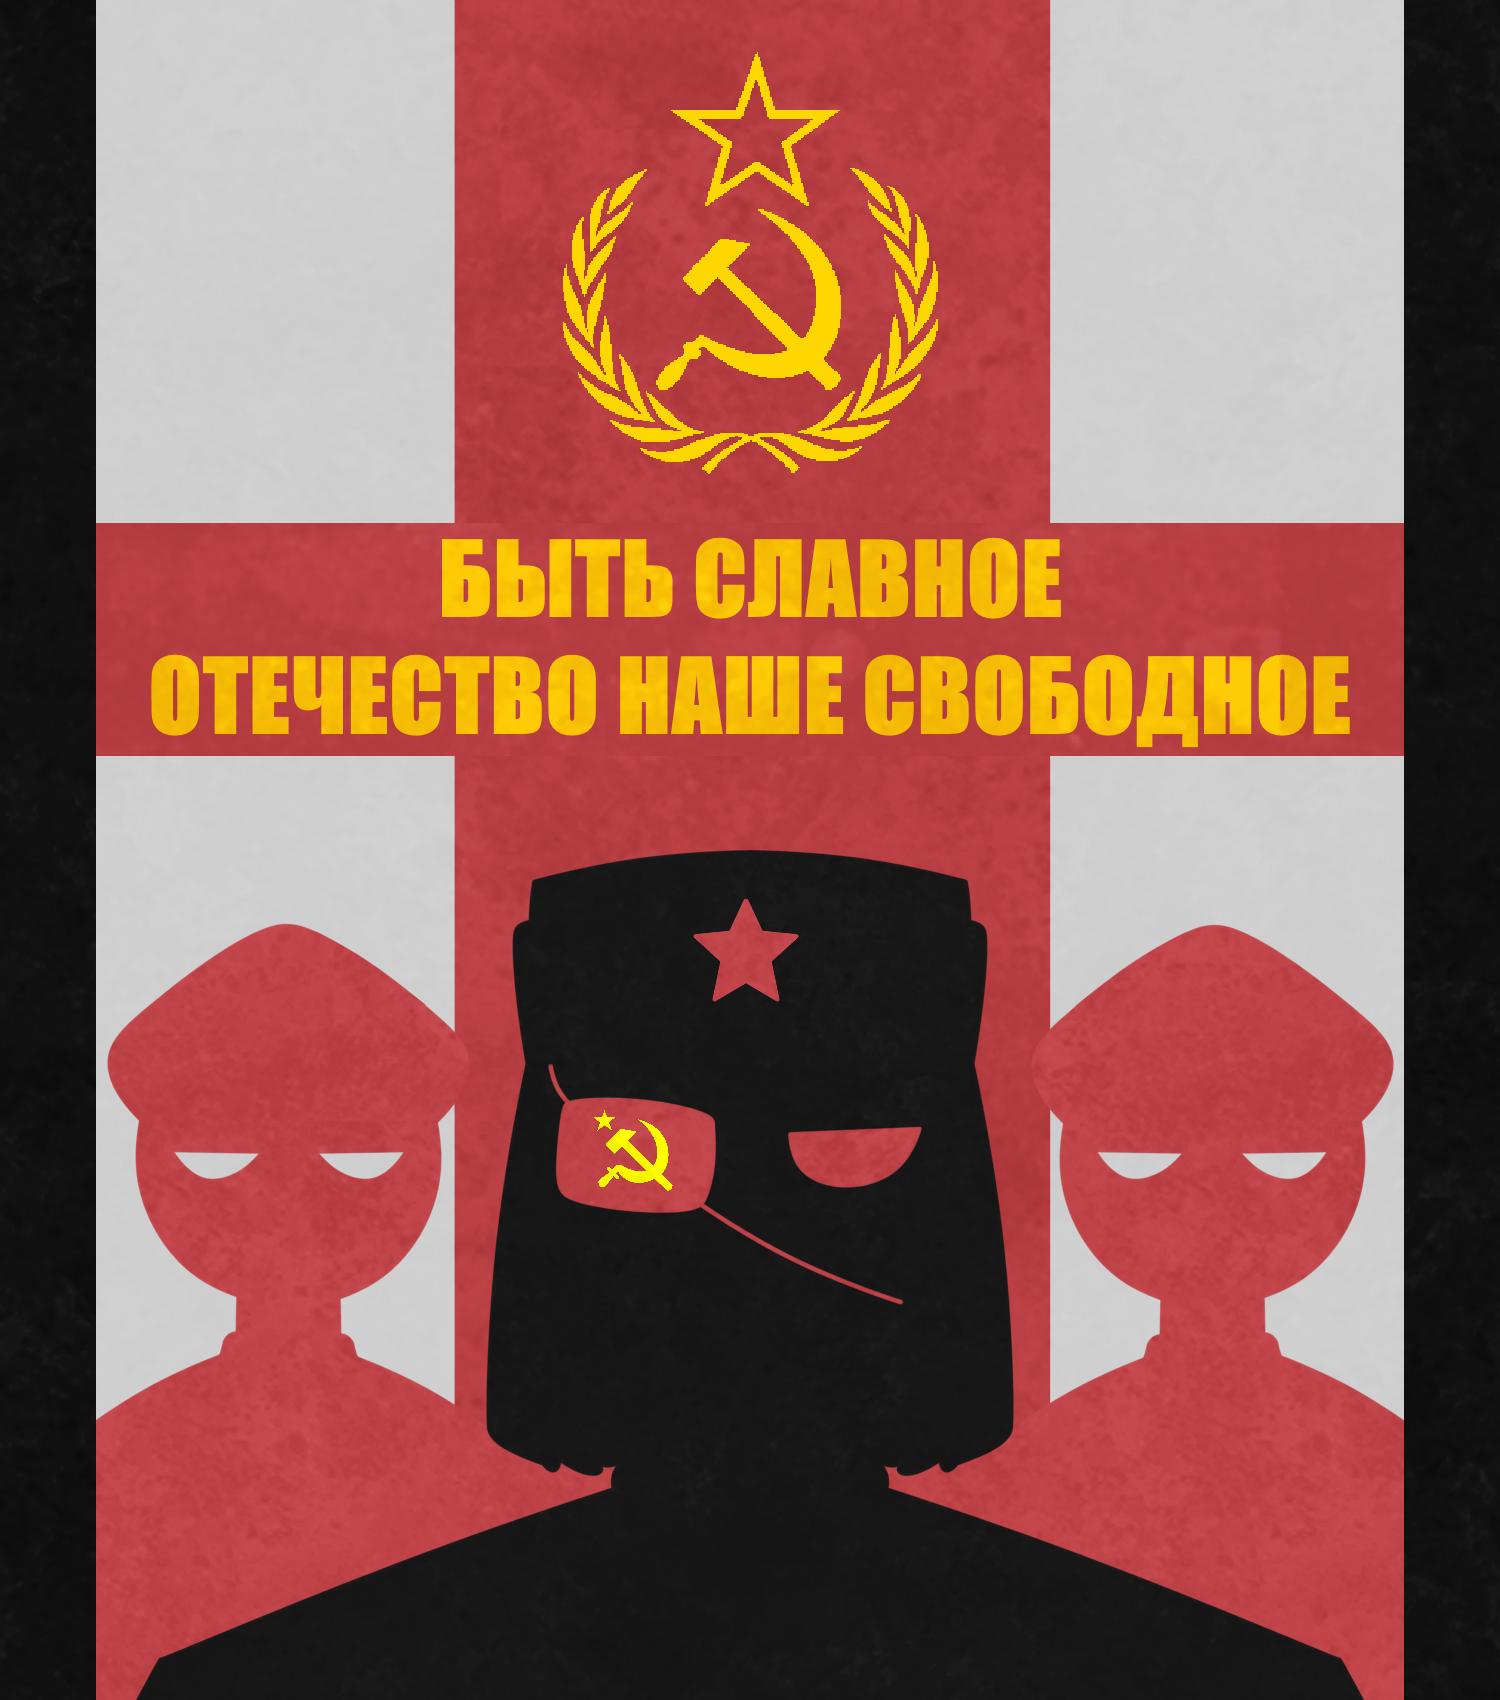 CountryHumans - USSR Propoganda by Ech0Chamber on Newgrounds